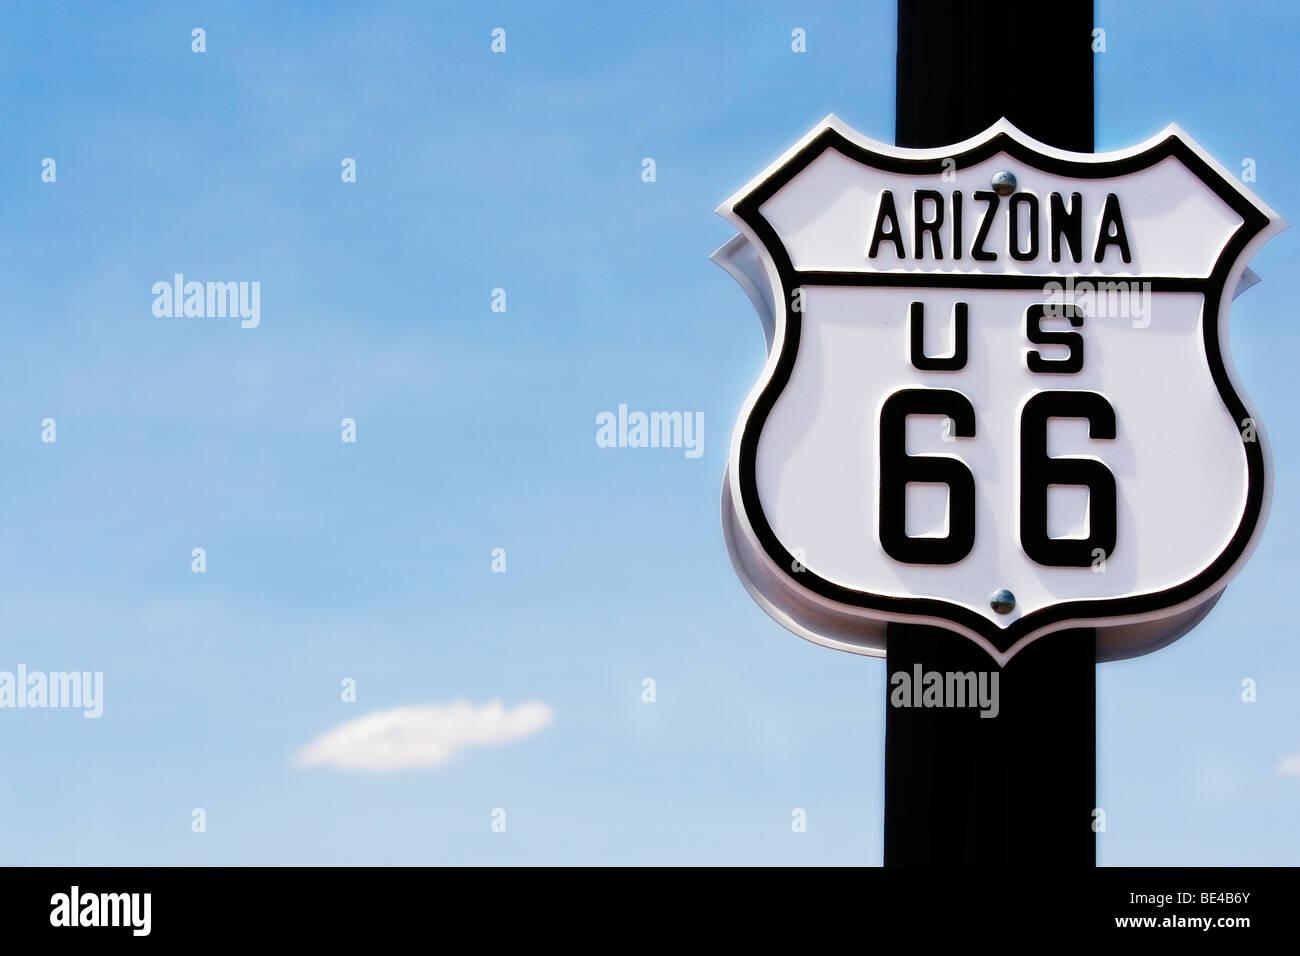 Route 66 - Arizona - Stock Image